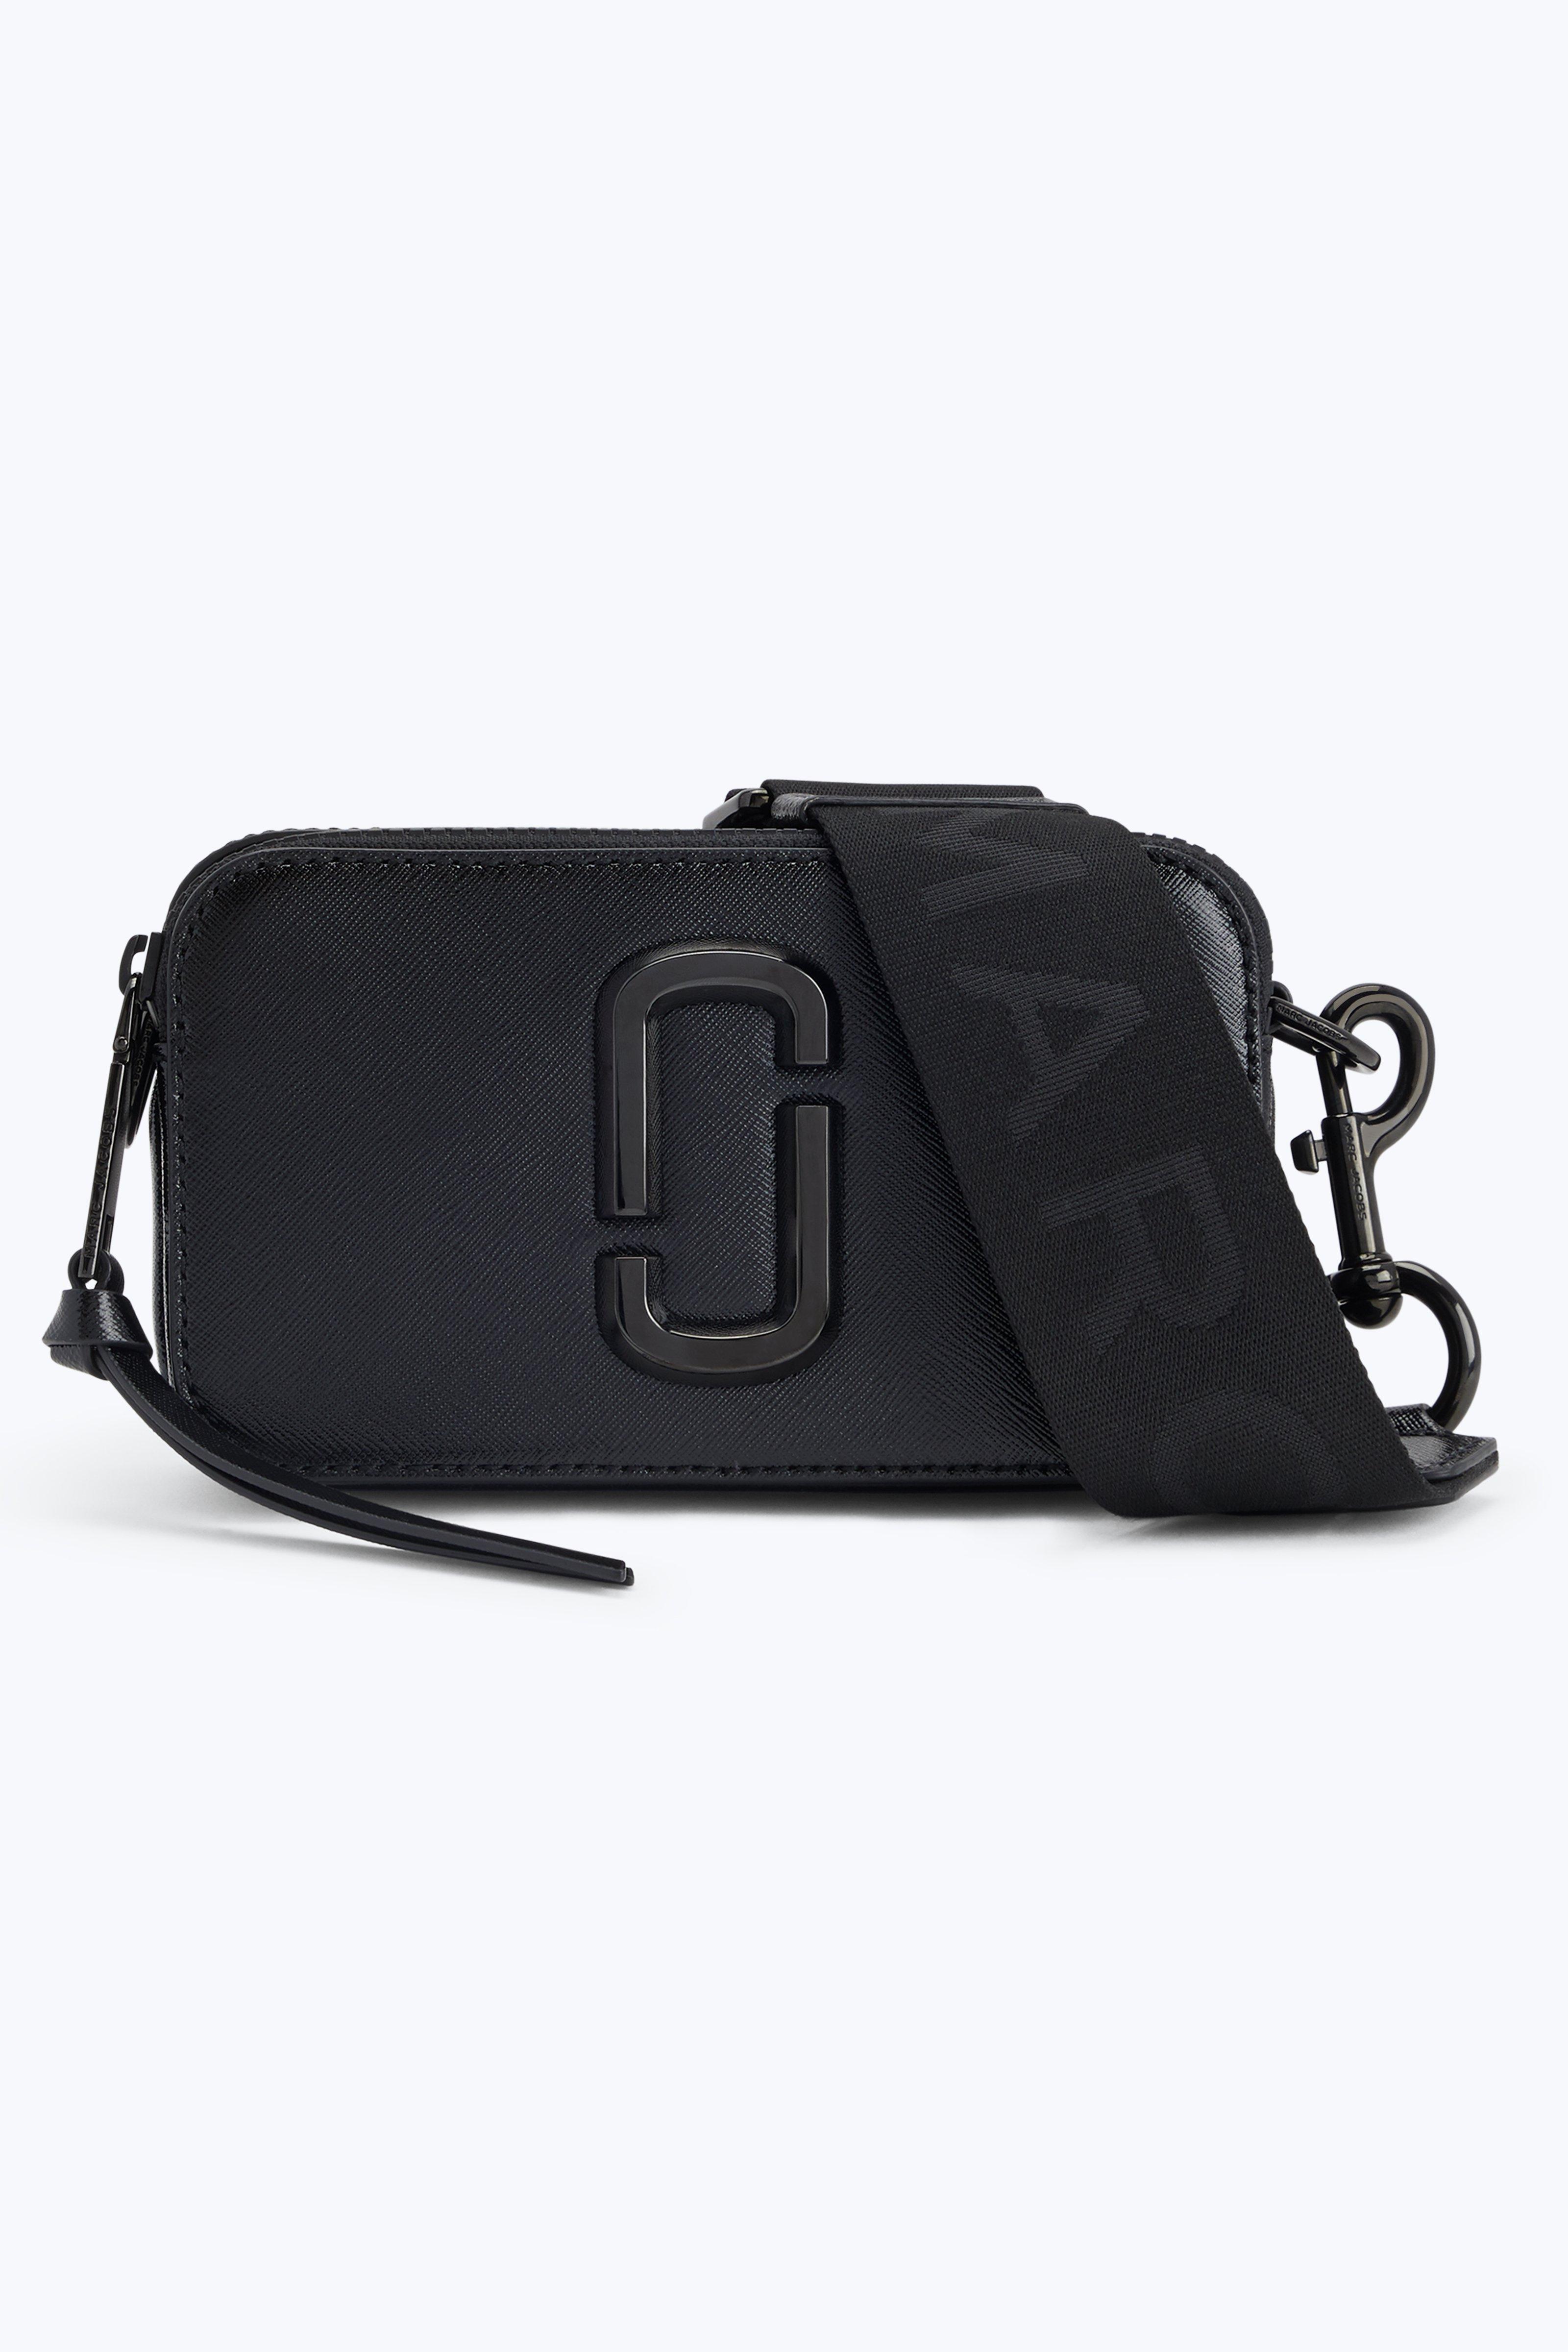 köpa marc jacobs väska online